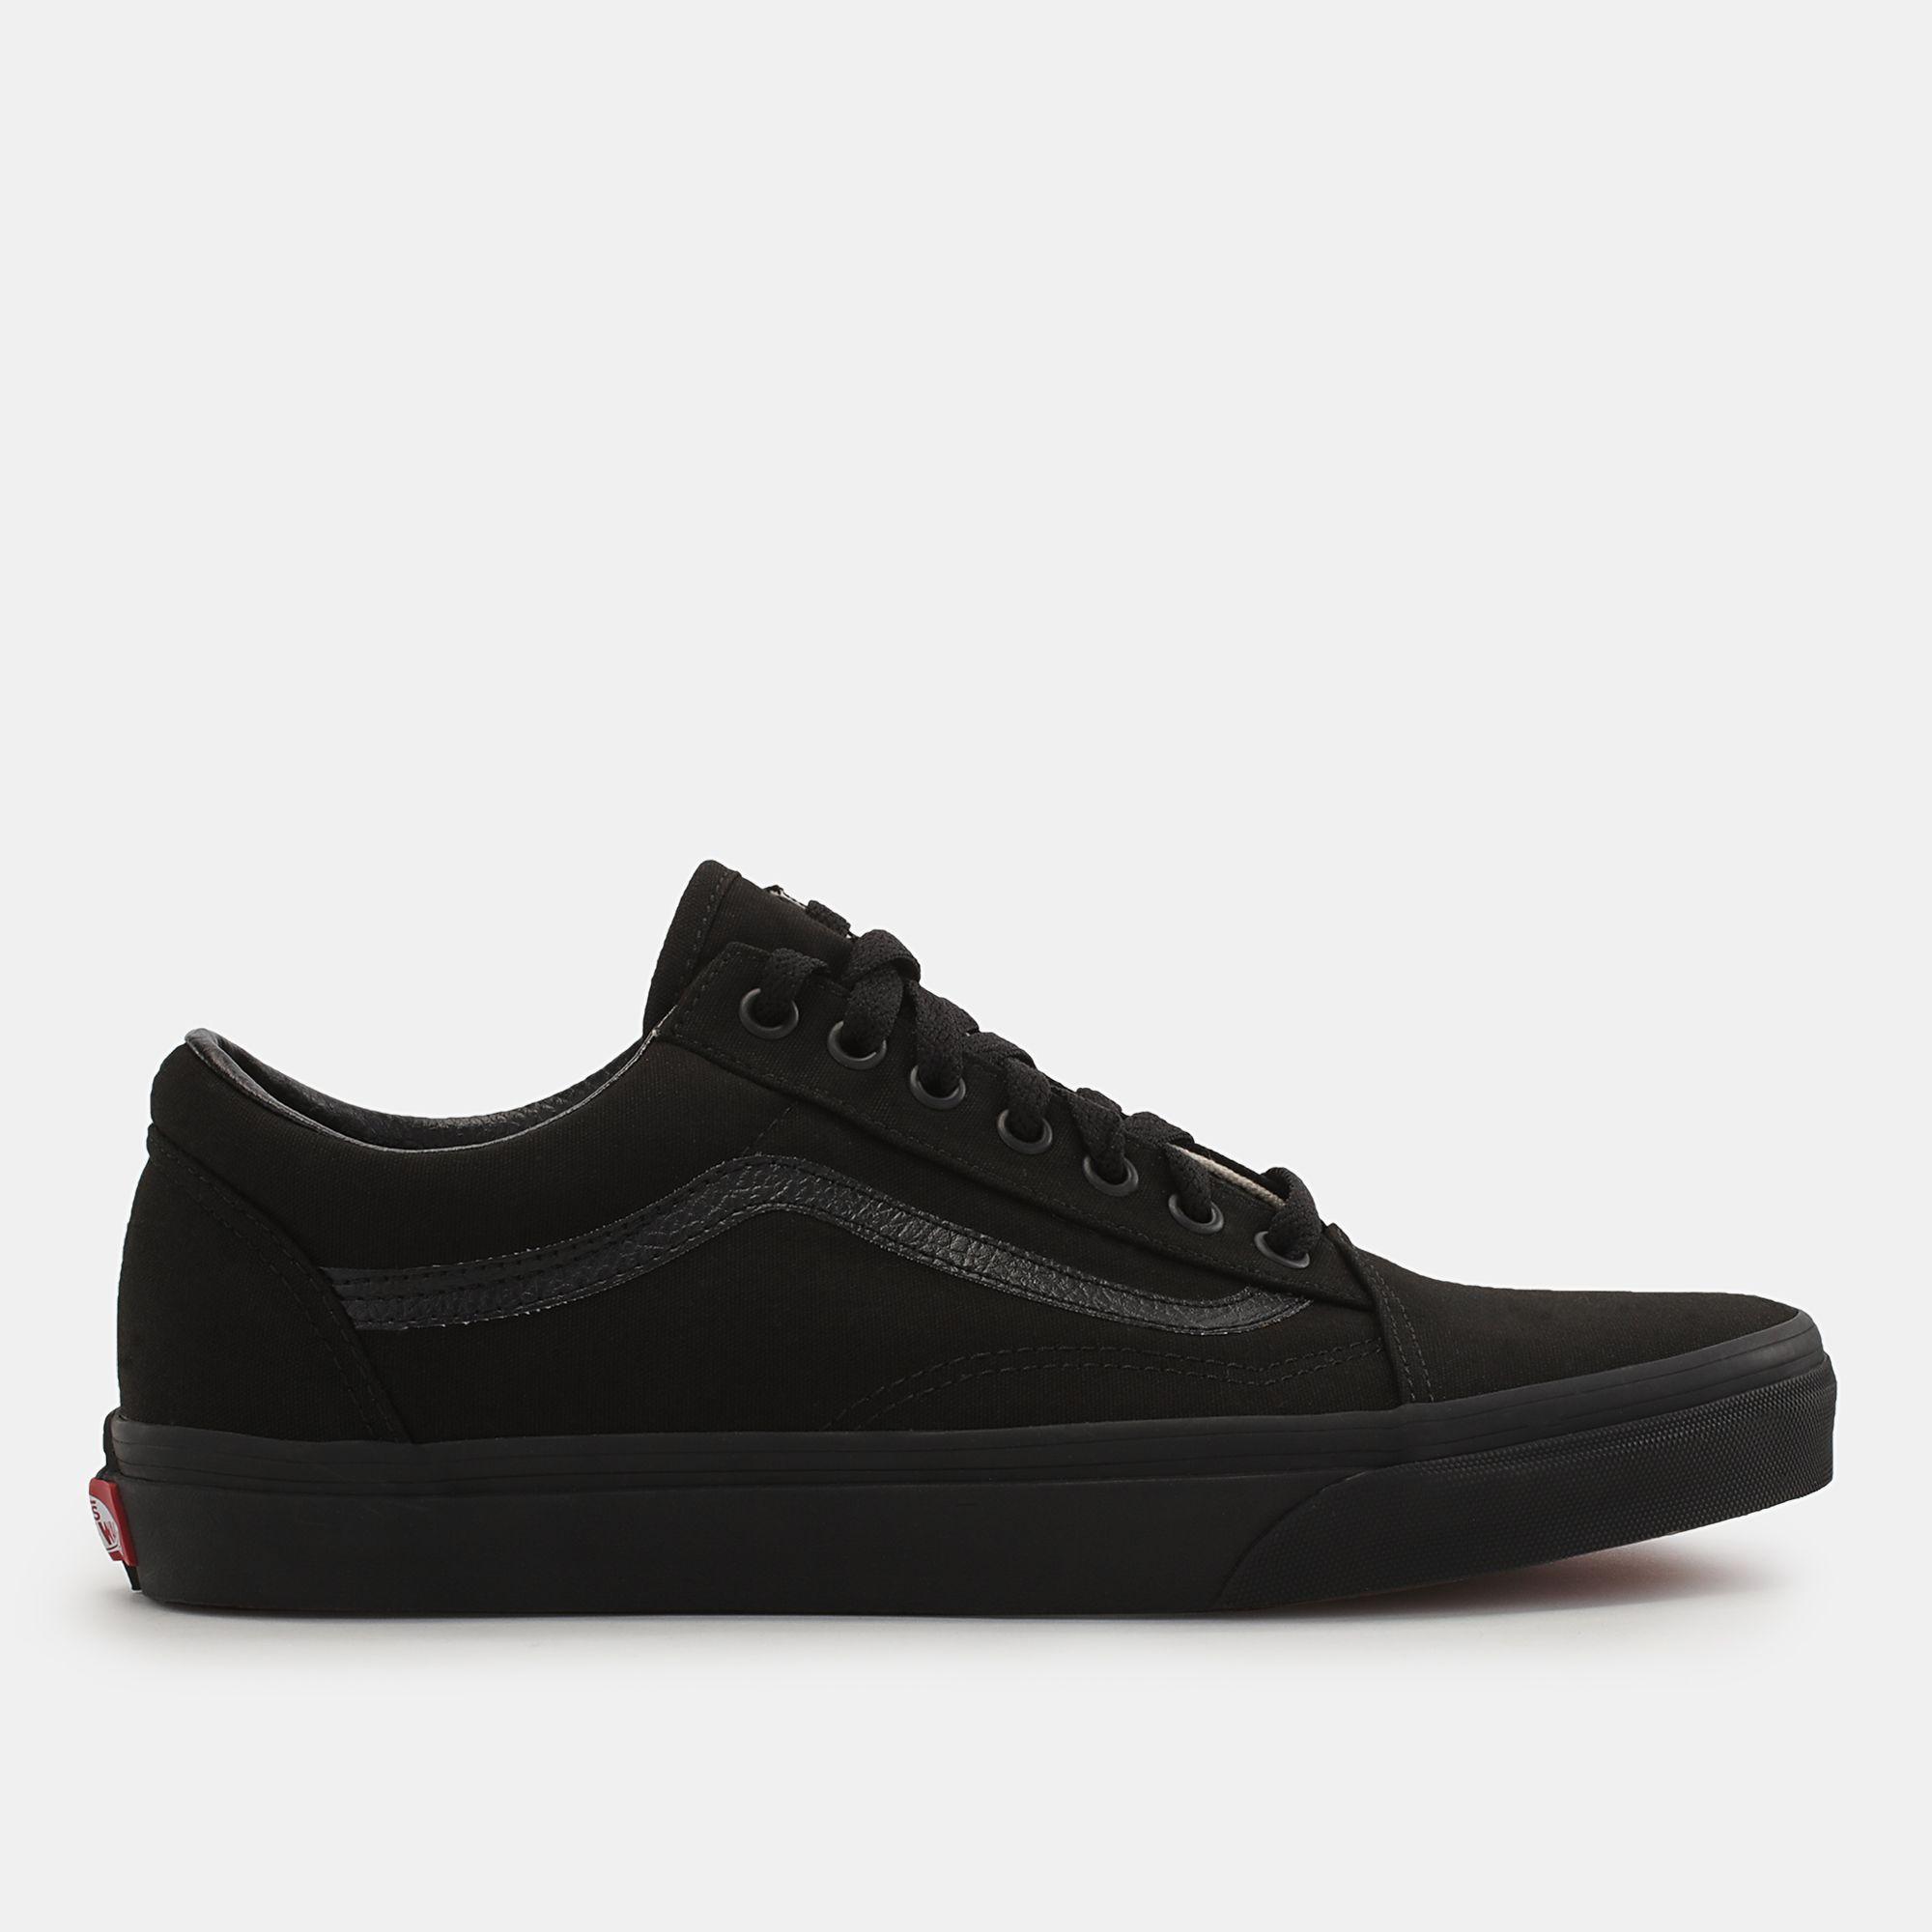 9992e770bc Shop Black Vans Canvas Old Skool Shoe for Unisex by Vans